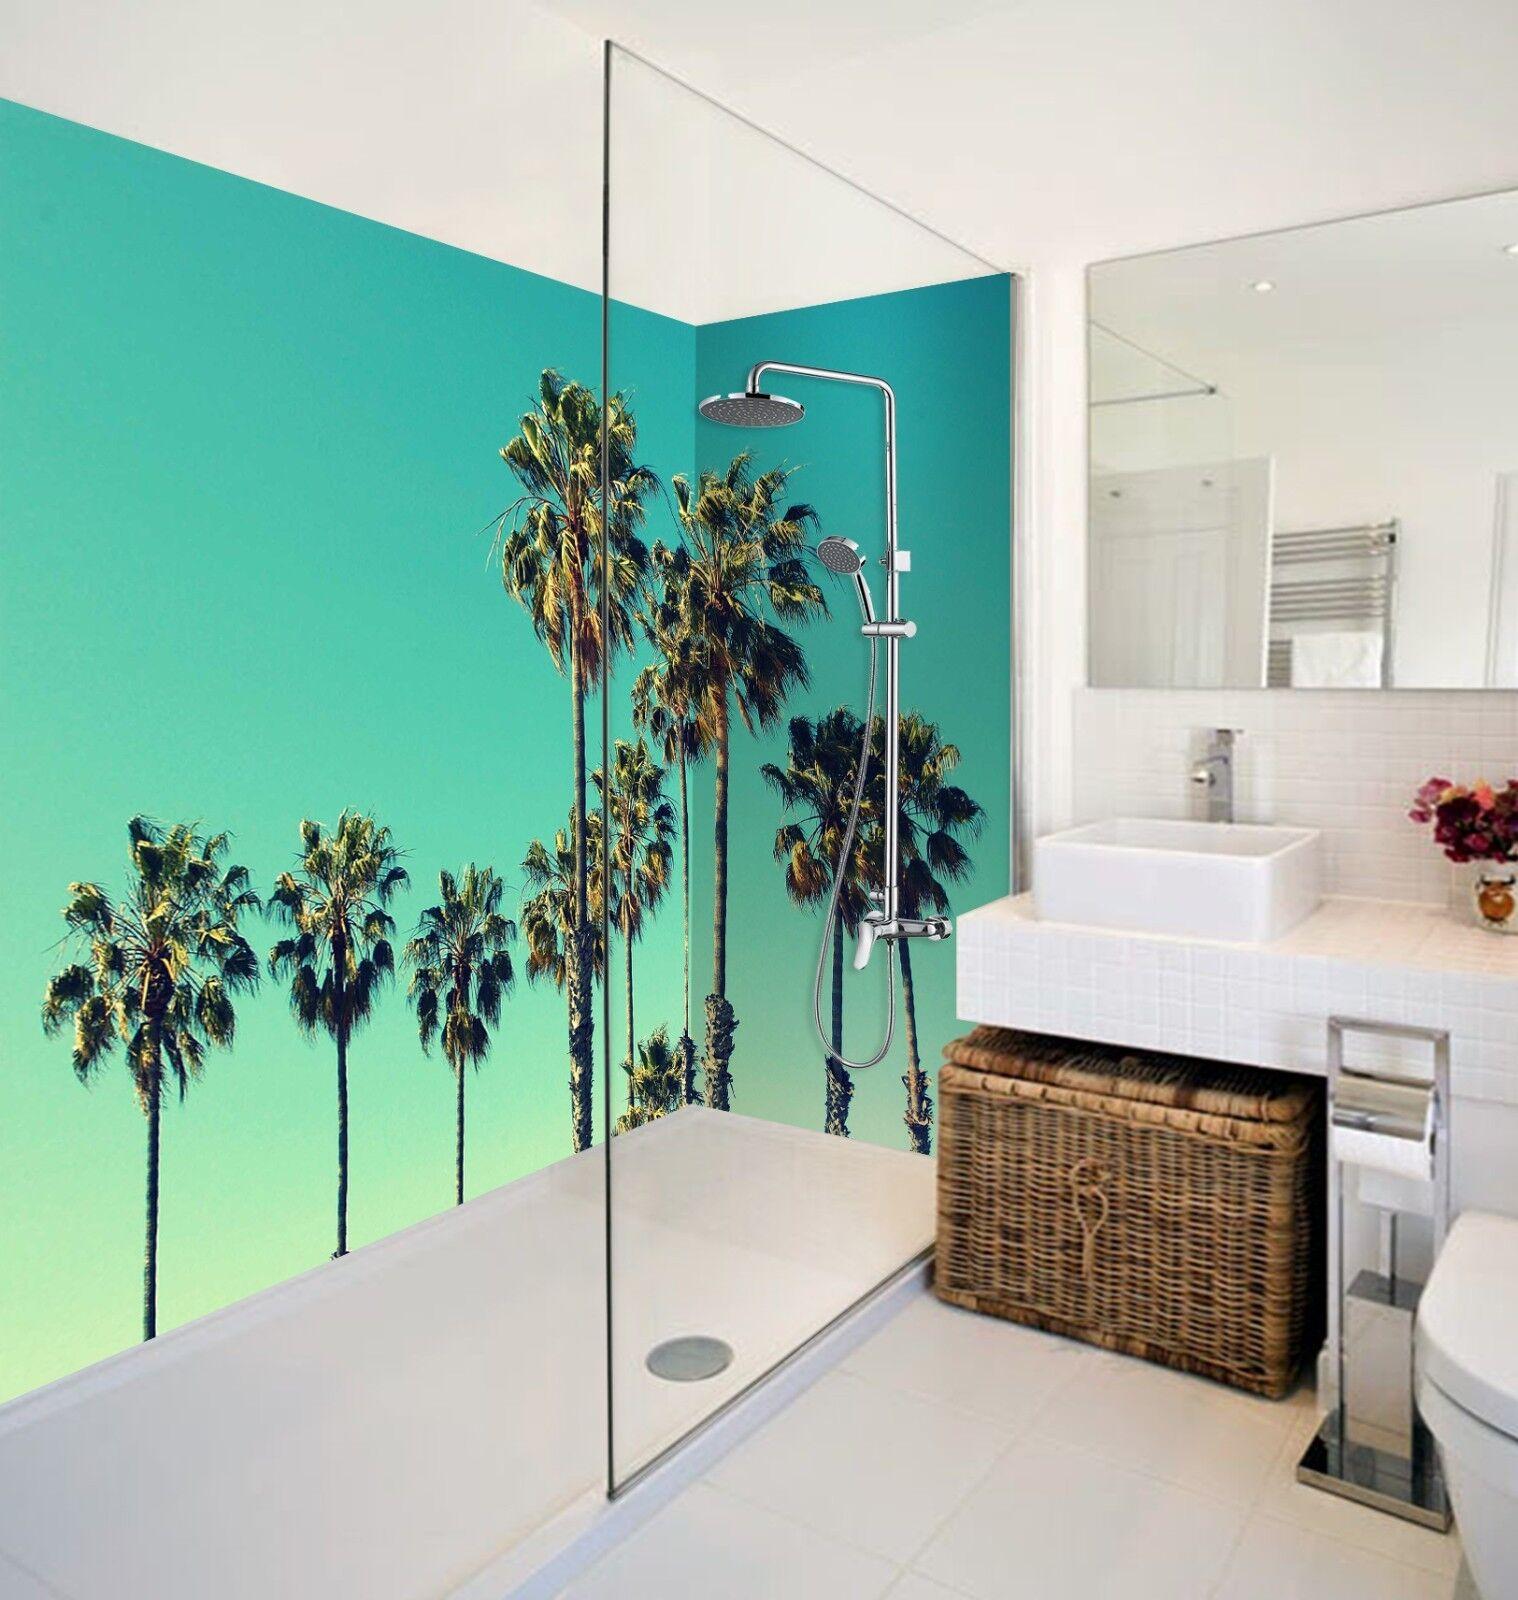 3D Grün Palm Trees Sky WallPaper Bathroom Print Decal Wall Deco AJ WALLPAPER UK